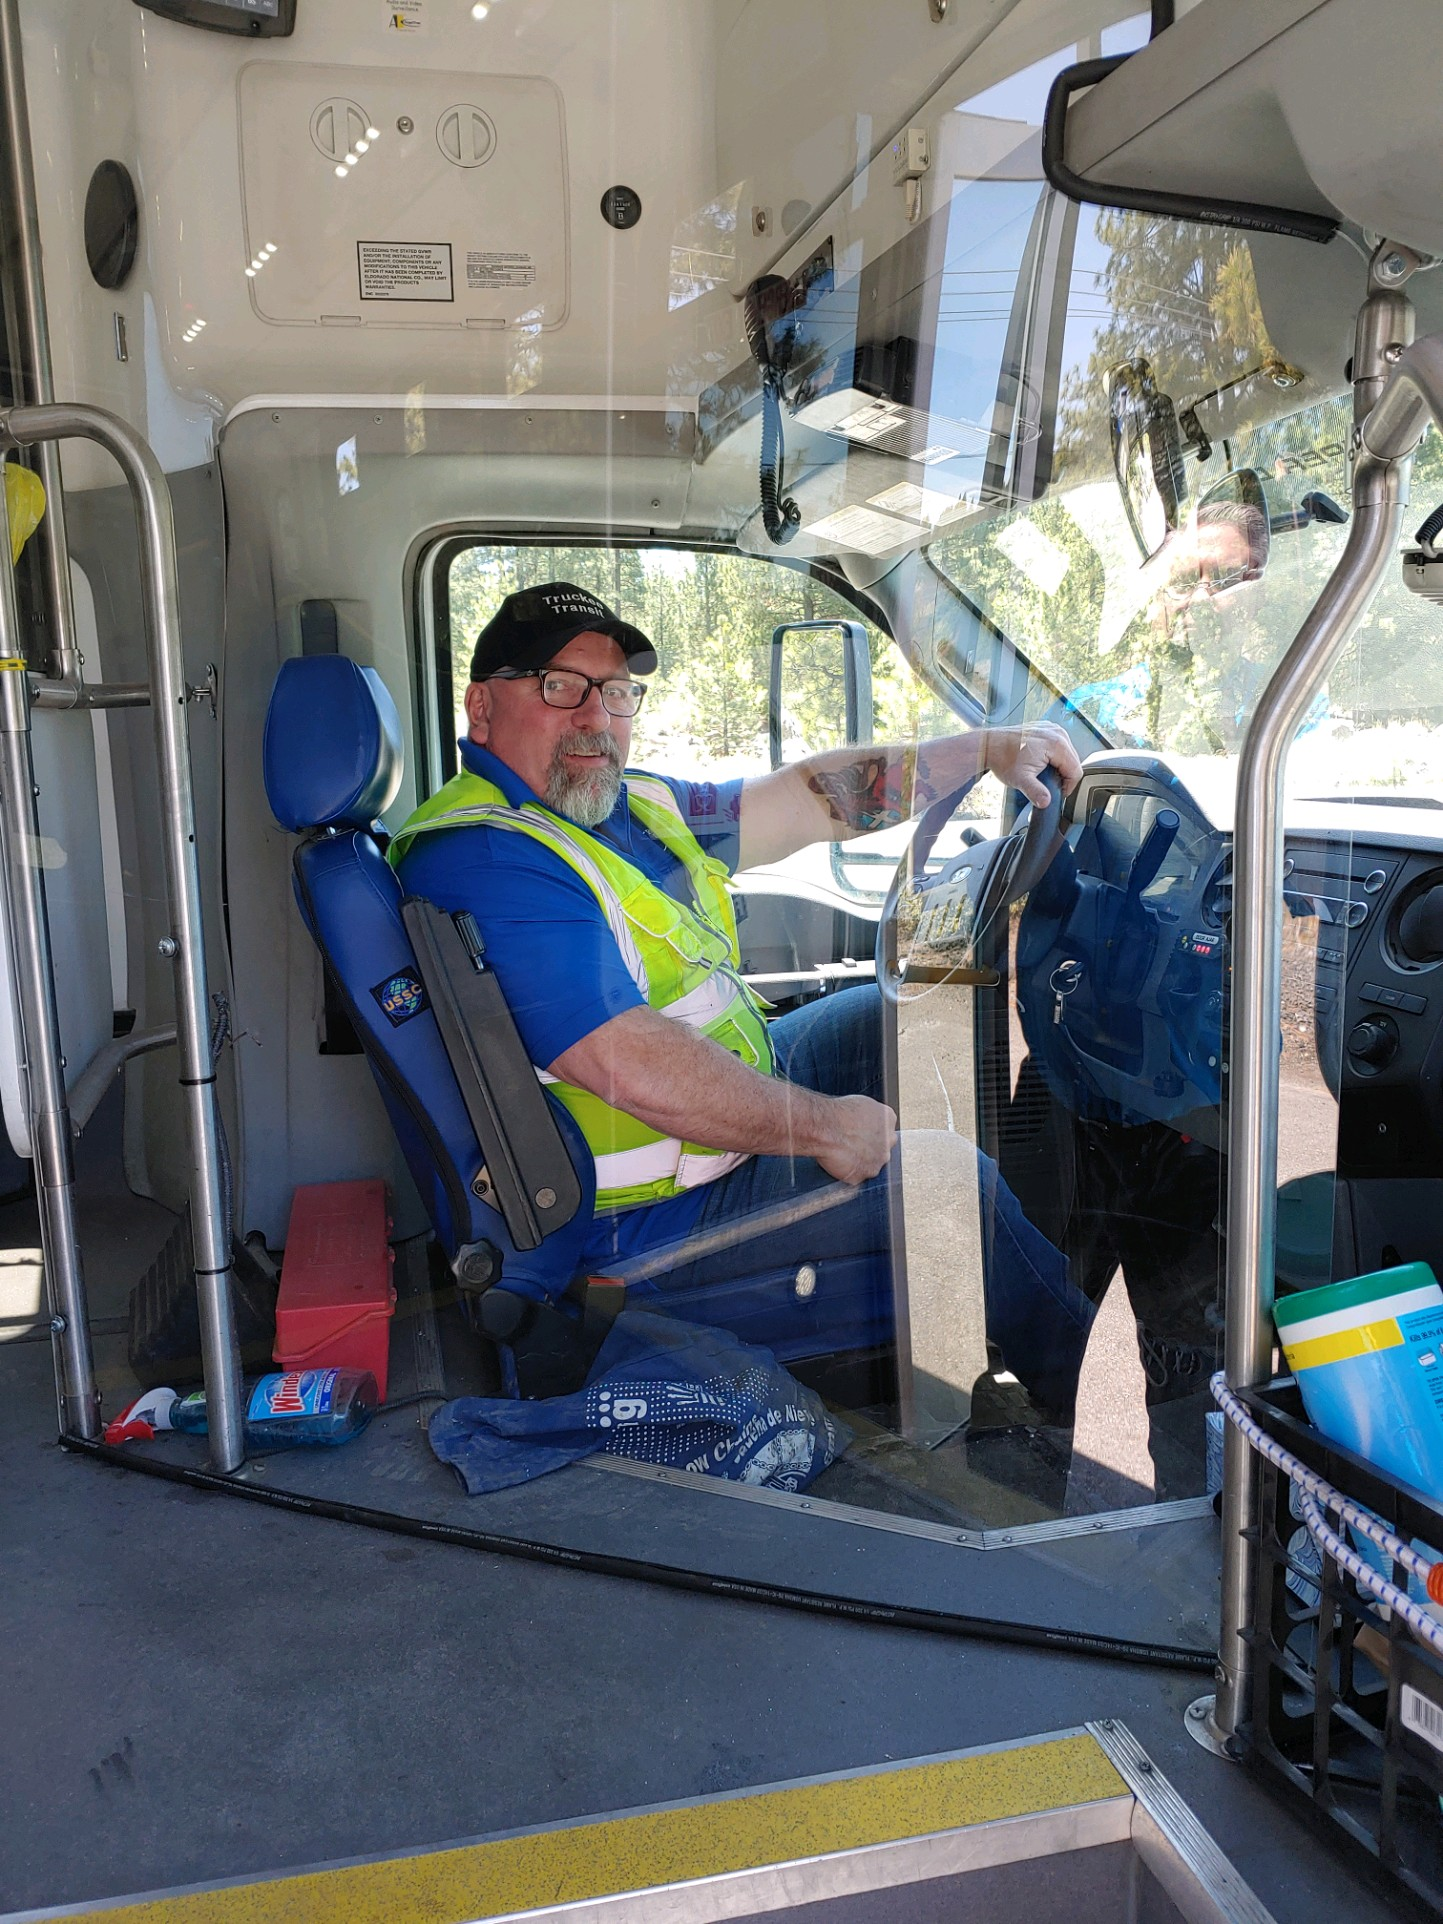 Driver behind plexiglass